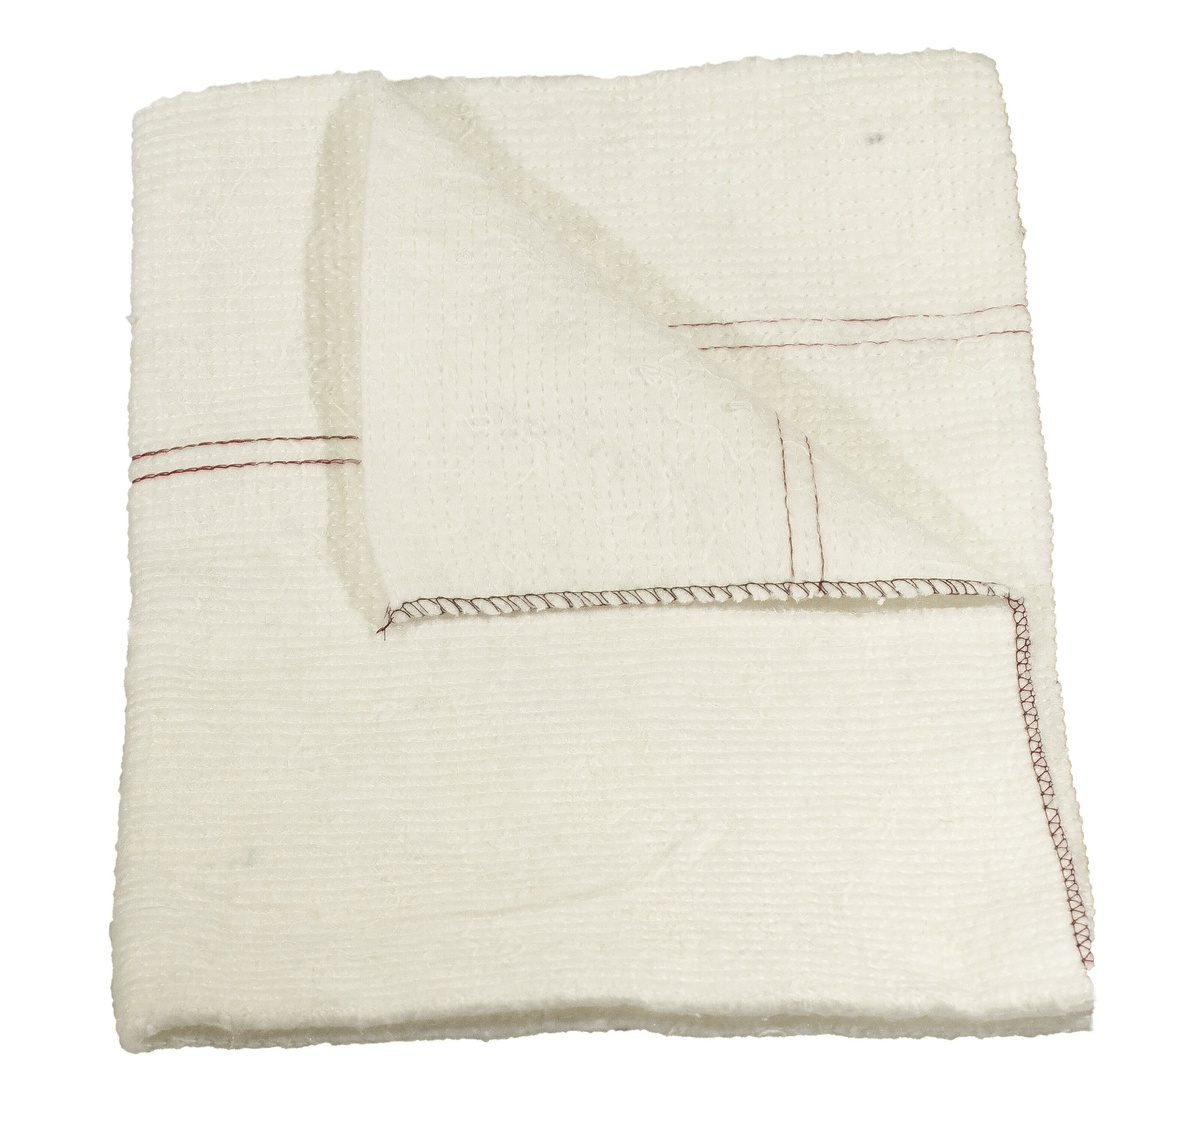 Handra na podlahu netkaná 50 x 70 cm, biela, 50 x 70 cm